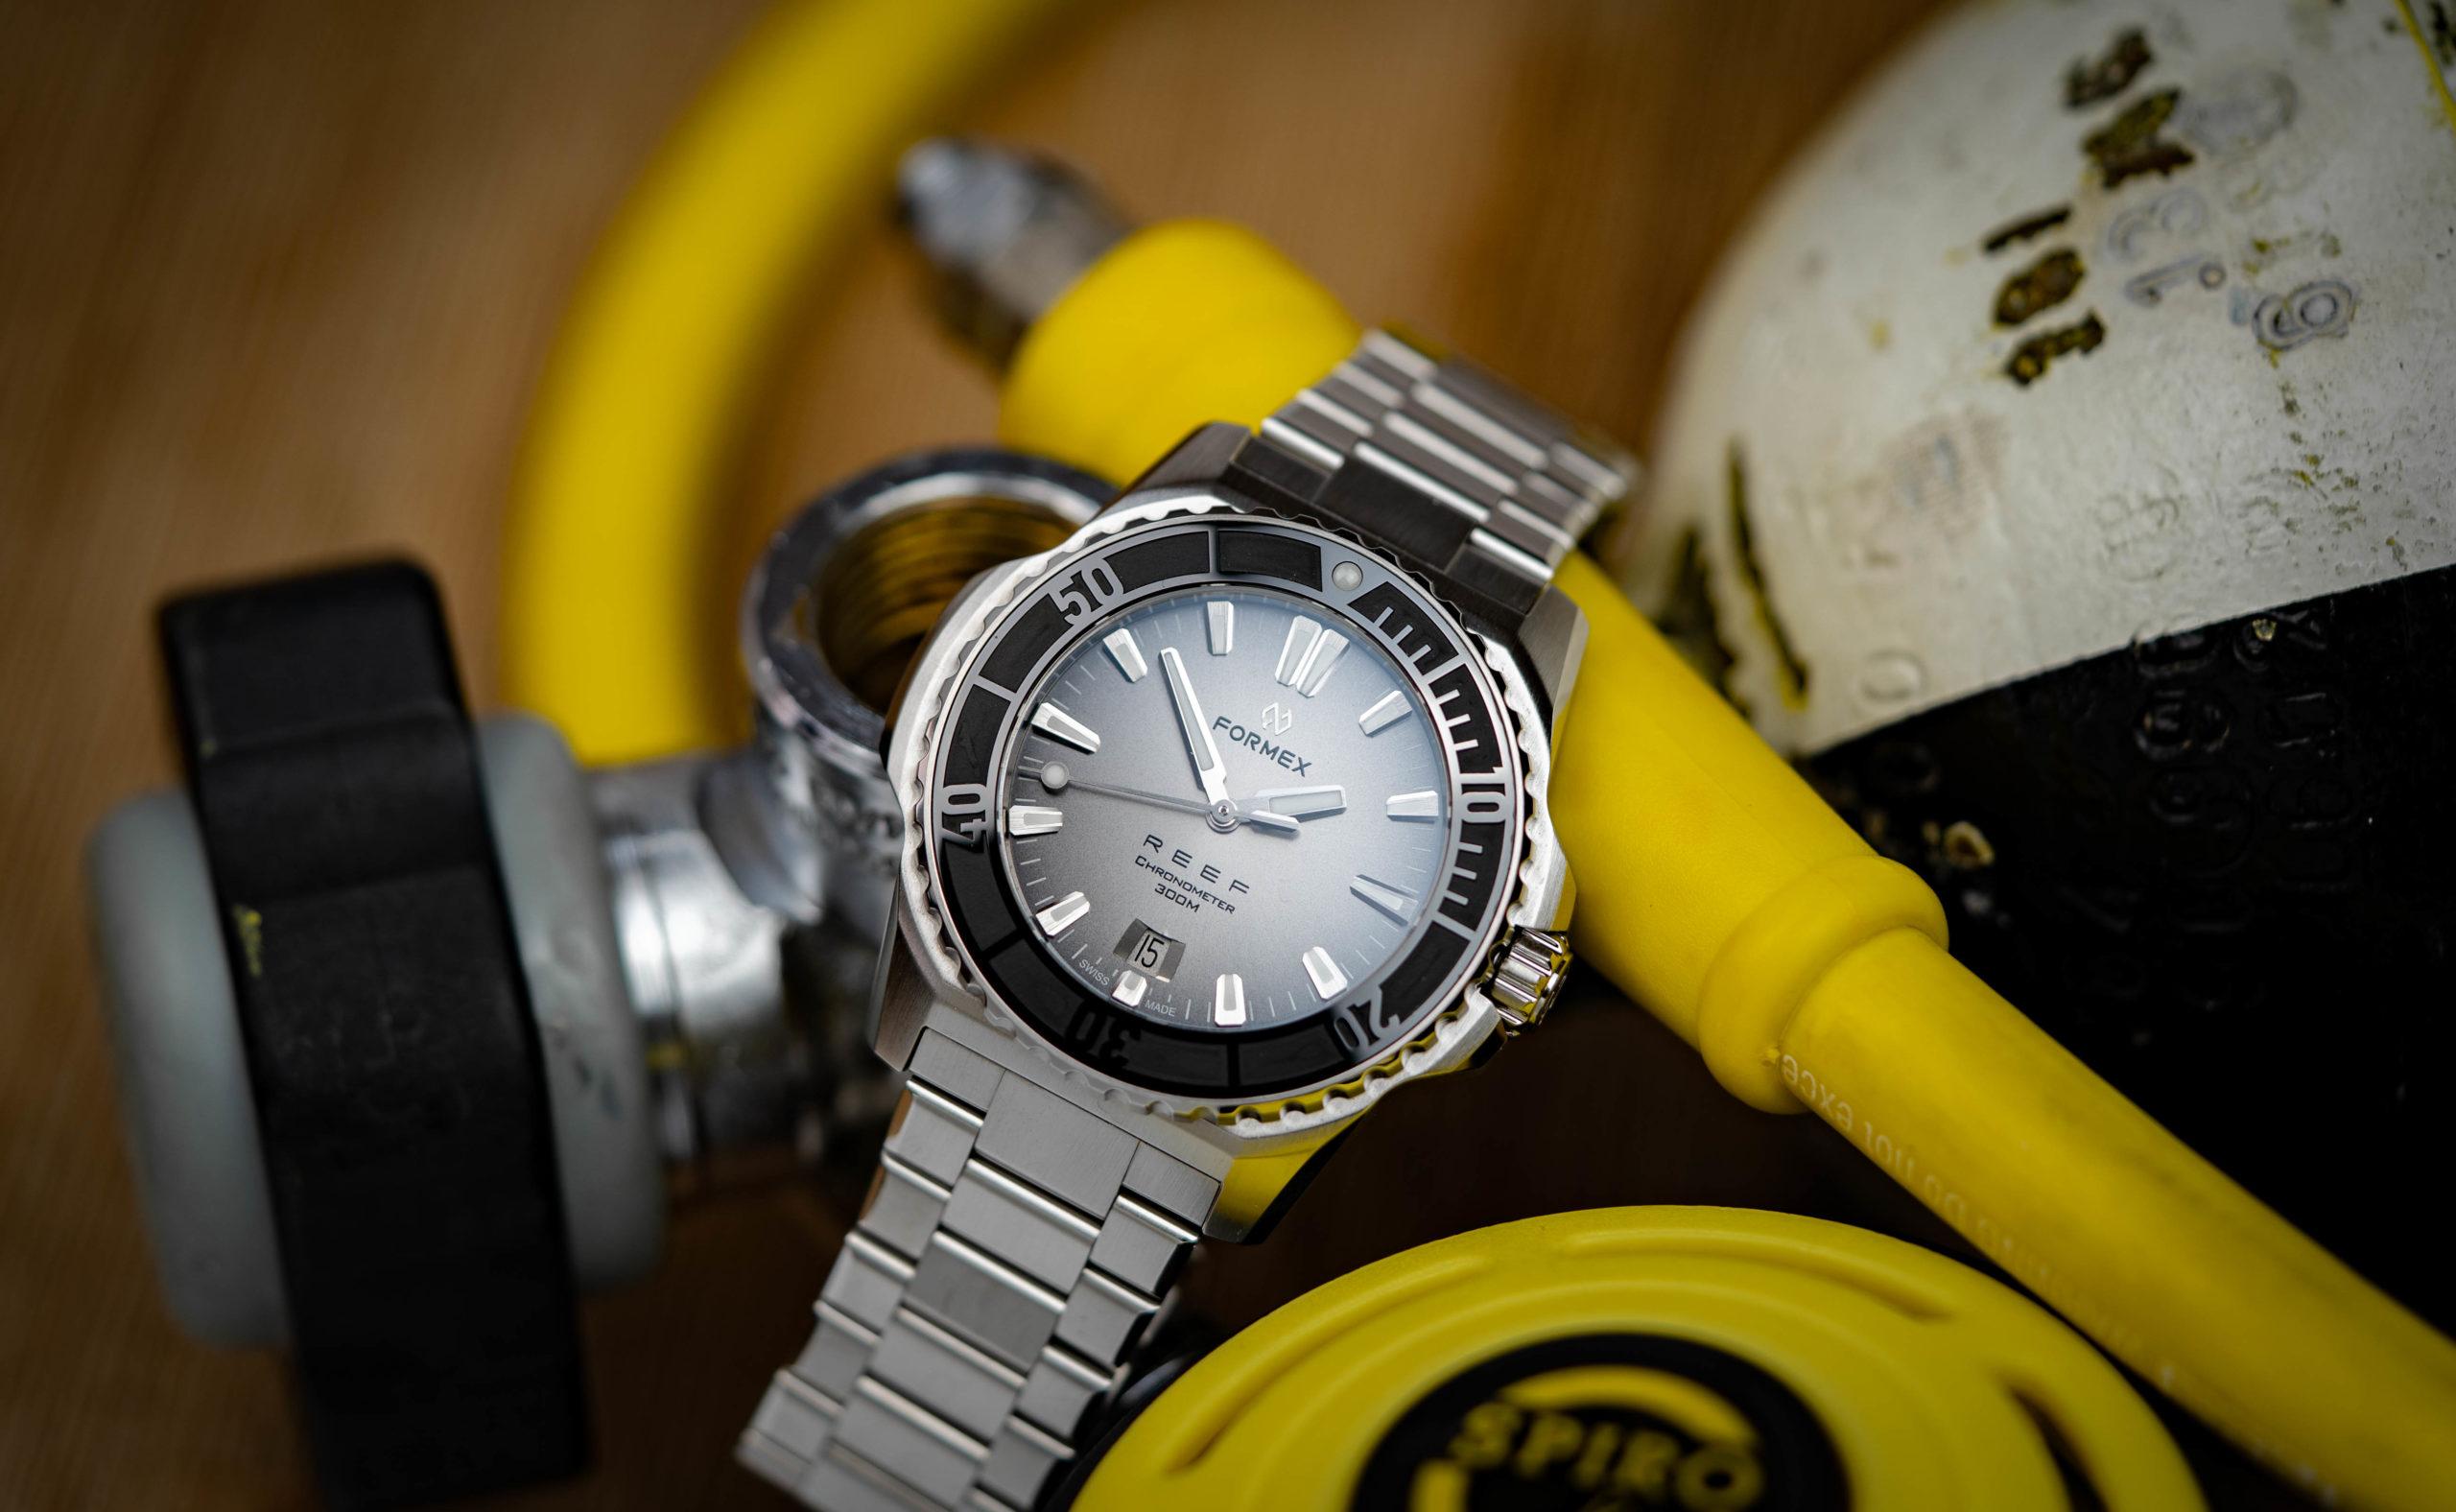 Formex-Reef-Automatik-Chronometer-300m-26